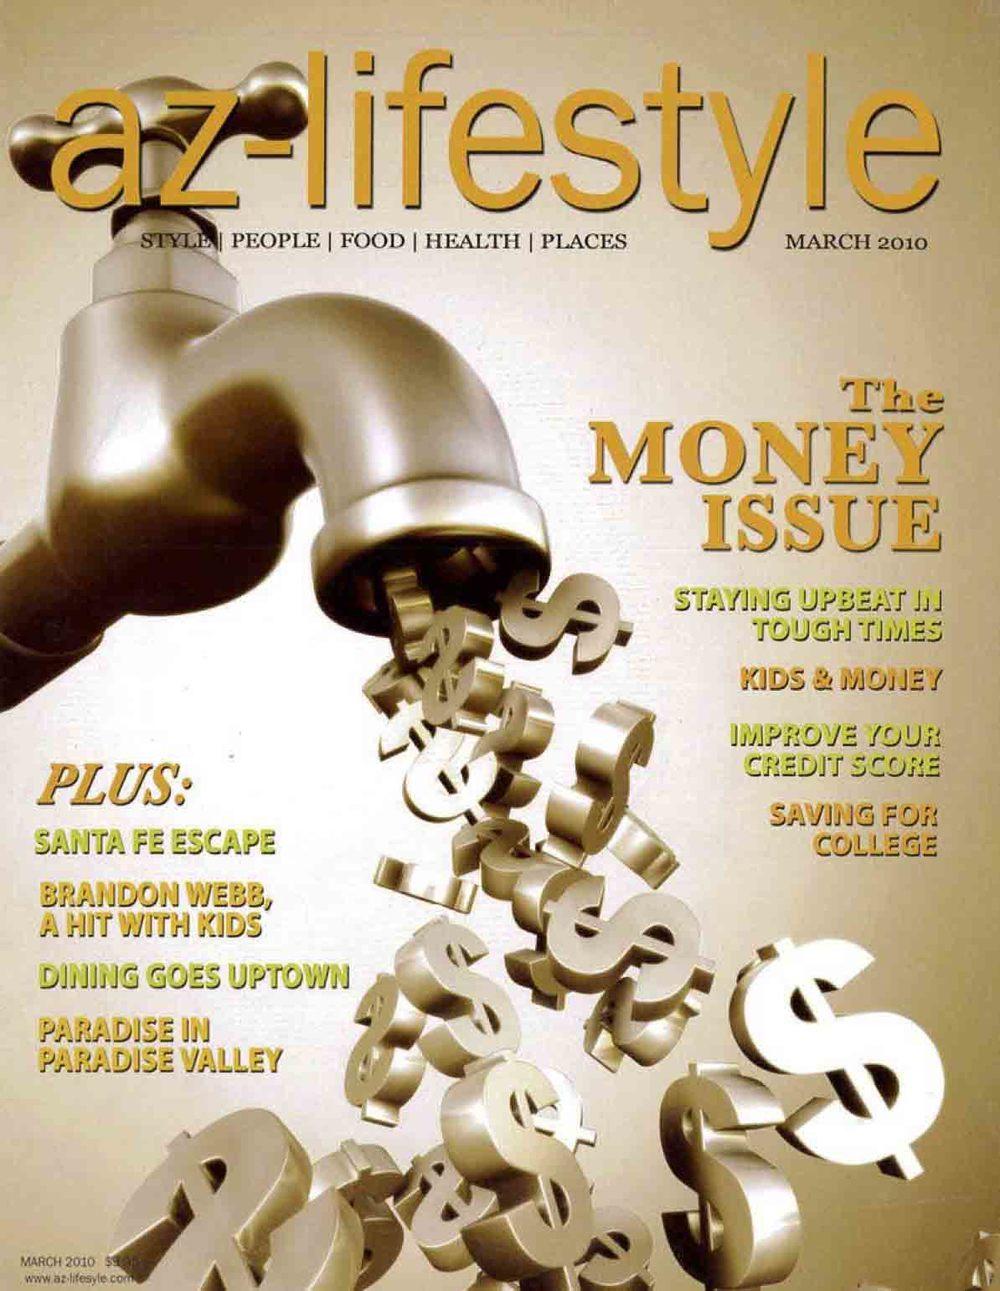 1 az lifestyle cover 03.10 72.jpg